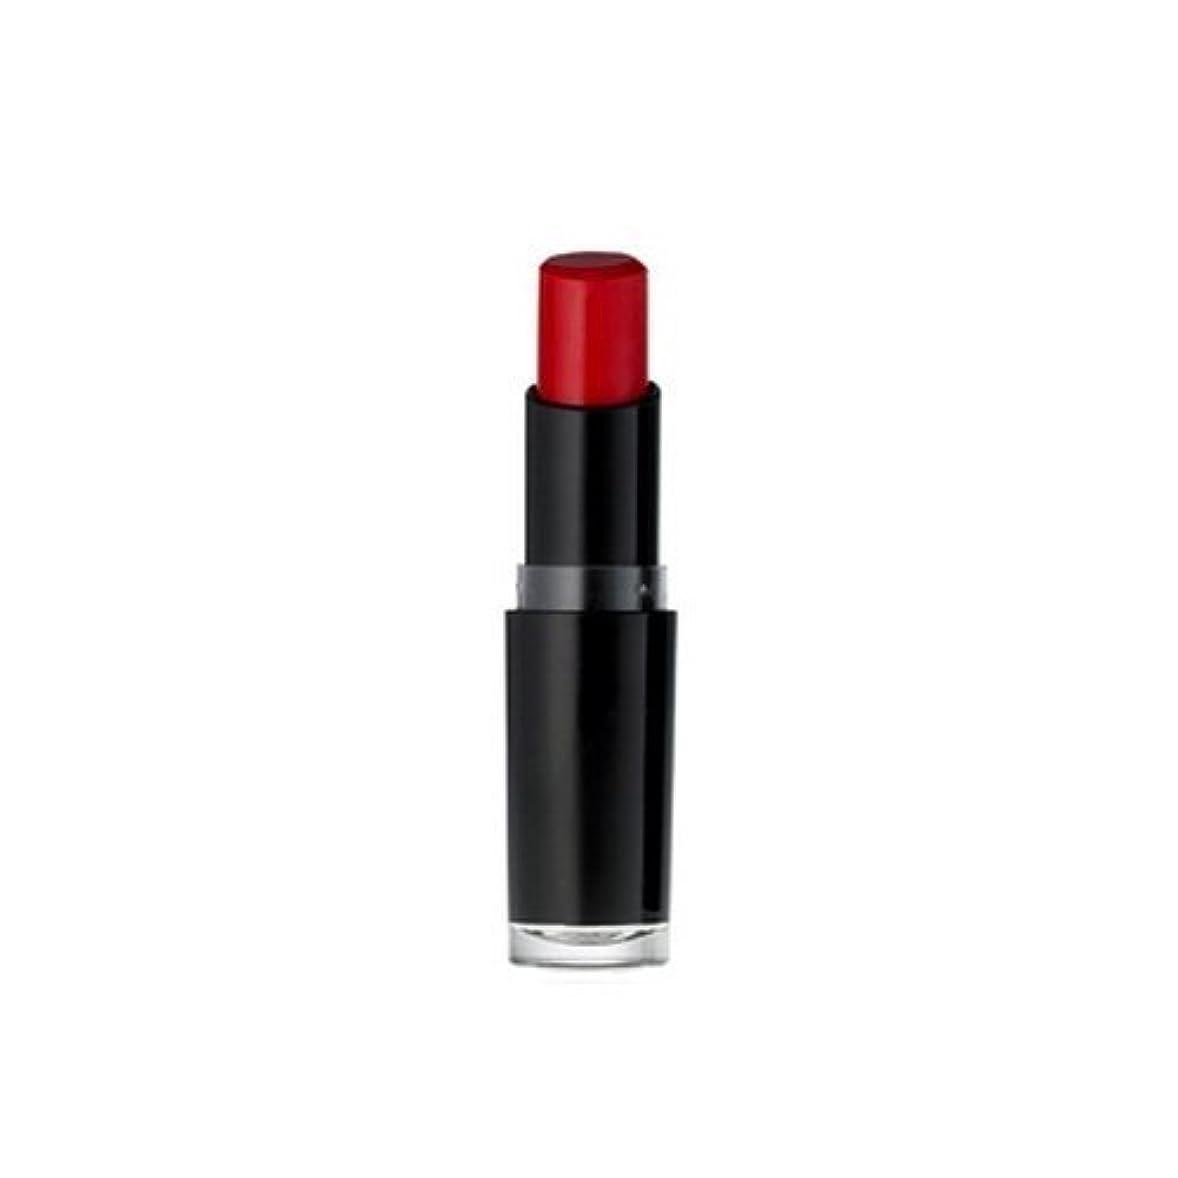 (3 Pack) WET N WILD Mega Last Matte Lip Cover Smokin' Hot Pink (並行輸入品)